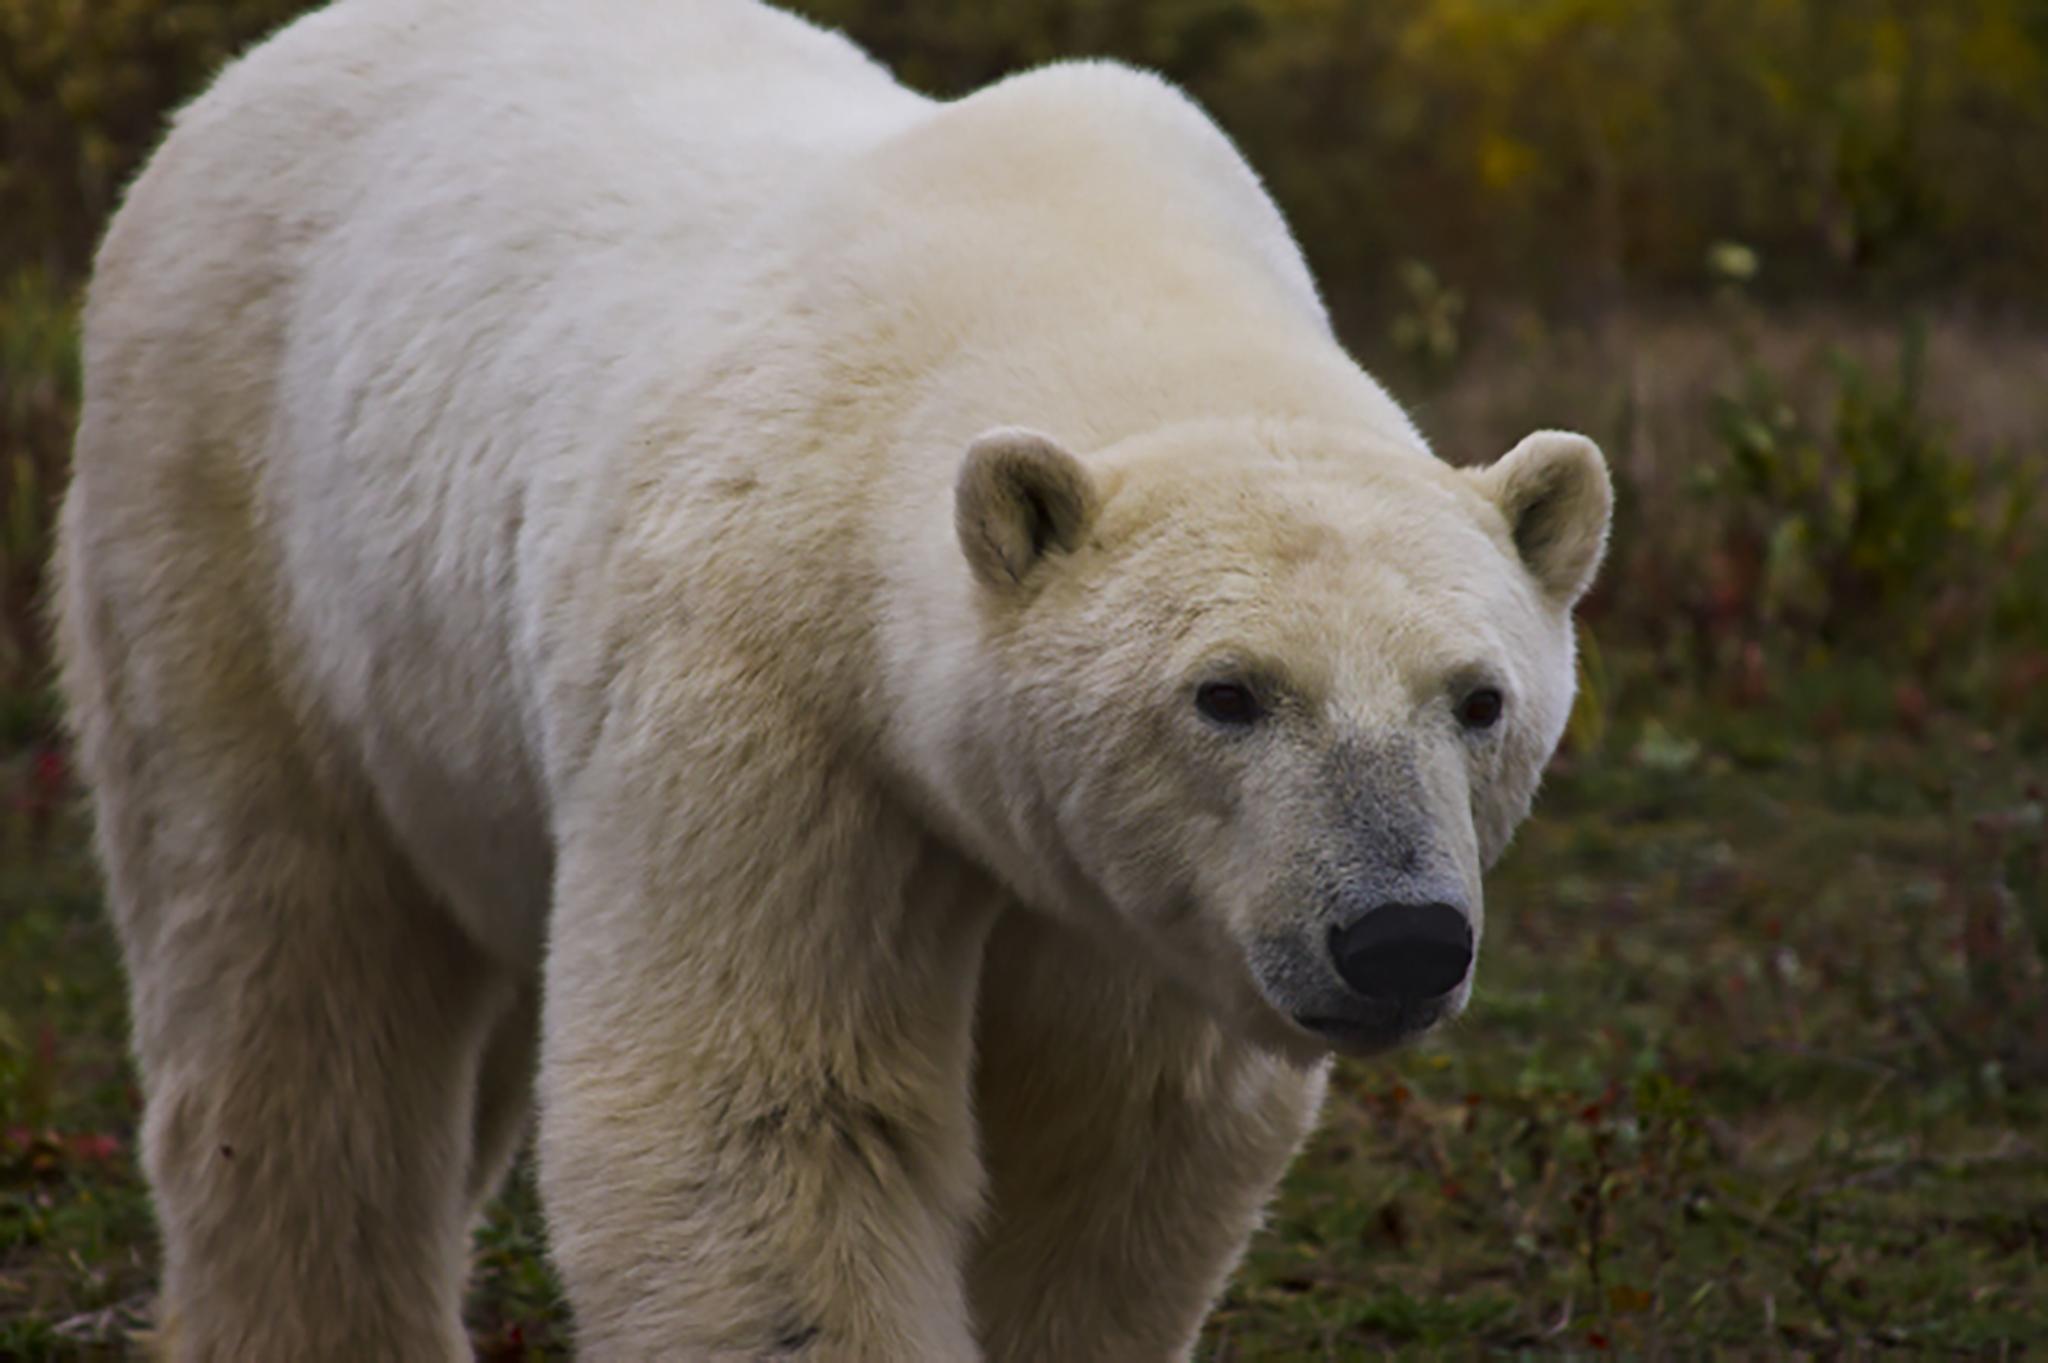 A polar bear near Hudson Bay, Manitoba in Canada on Mallory on Travel adventure travel, photography, travel iain-mallory-300-74